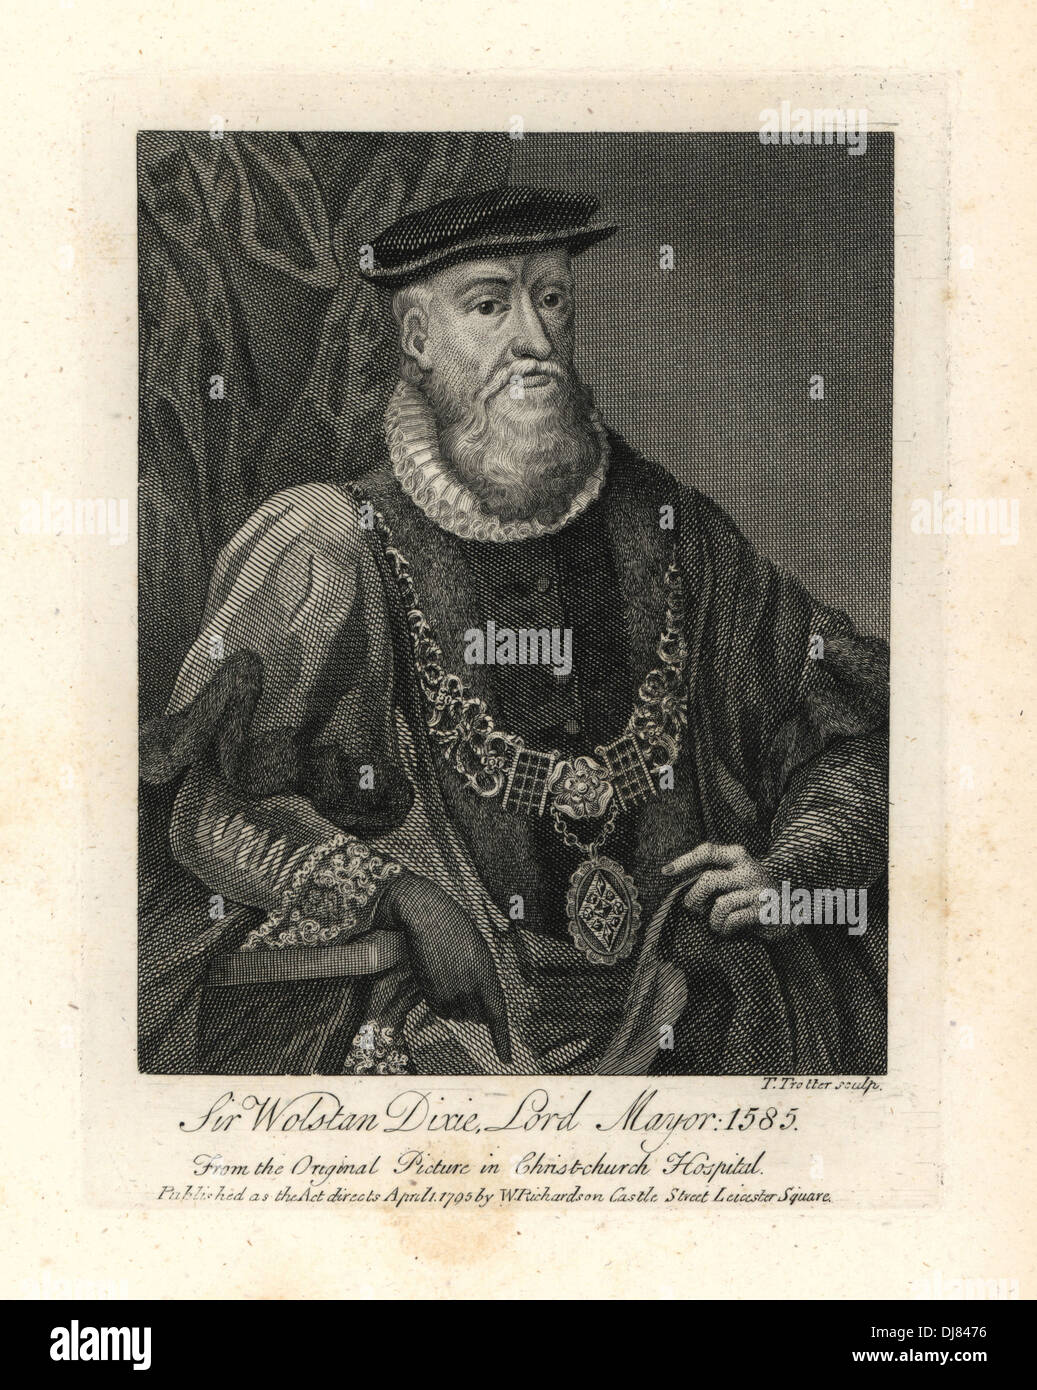 Sir Wolstan Dixie, Lord Mayor of London, died 1585. - Stock Image